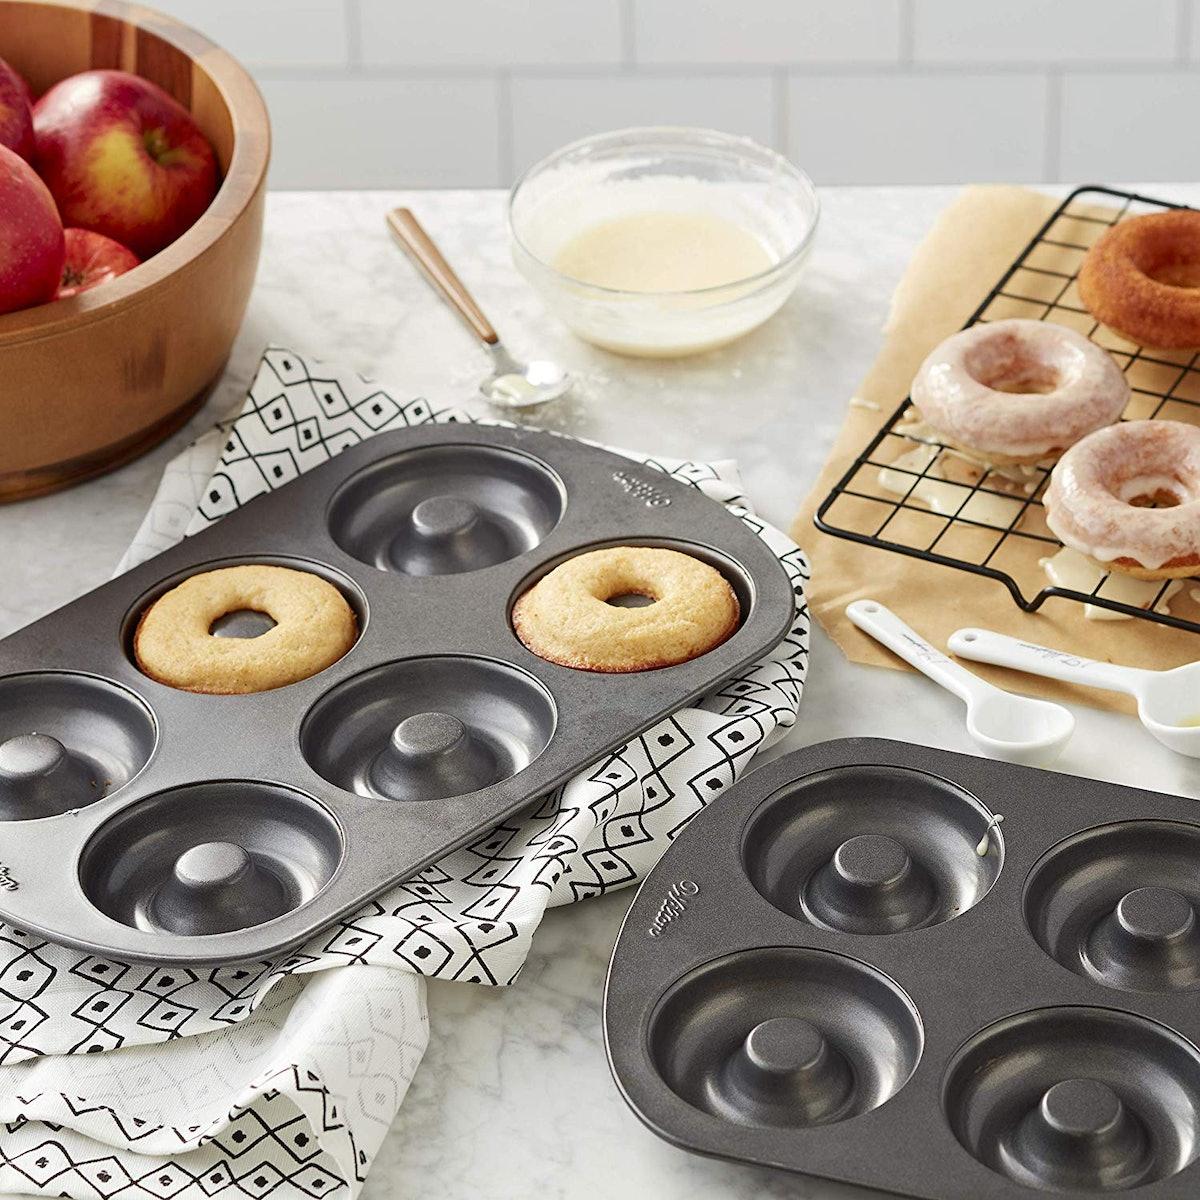 Wilton Non-Stick Donut Baking Pans (2-Pack)